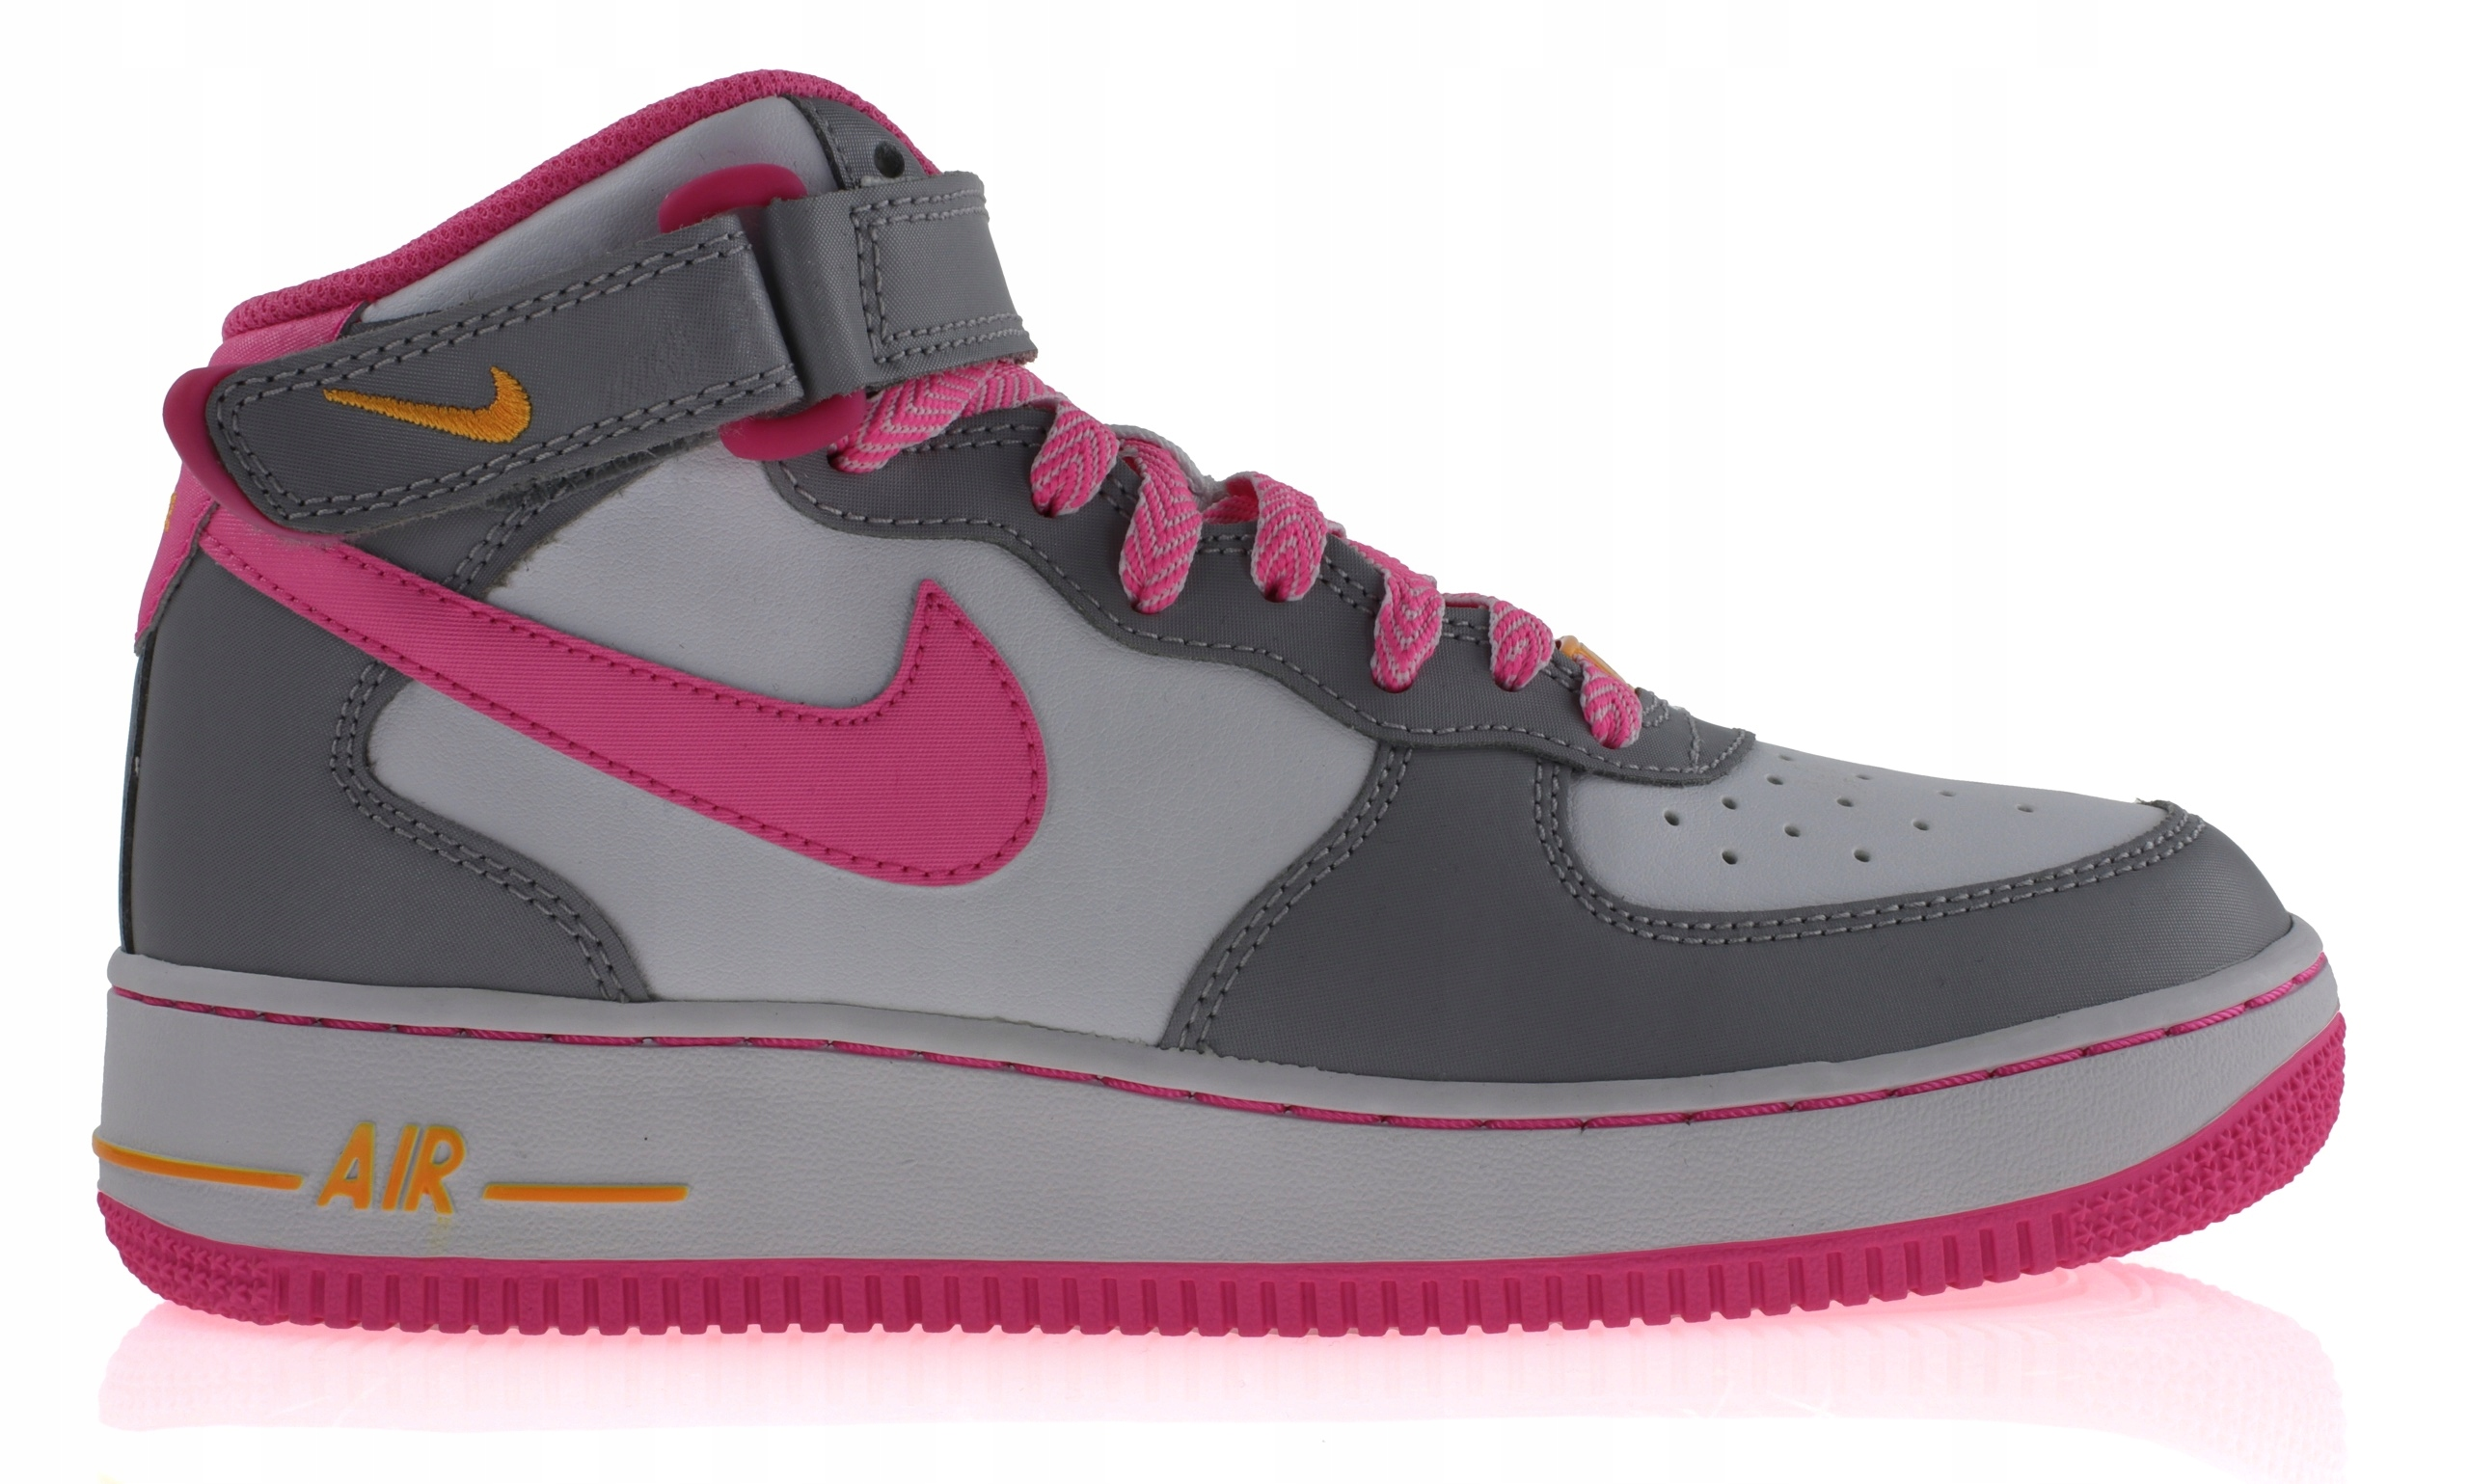 Buty Nike Air Jordan 1 MID Bg 554725 050 R. 38.5 Ceny i opinie Ceneo.pl